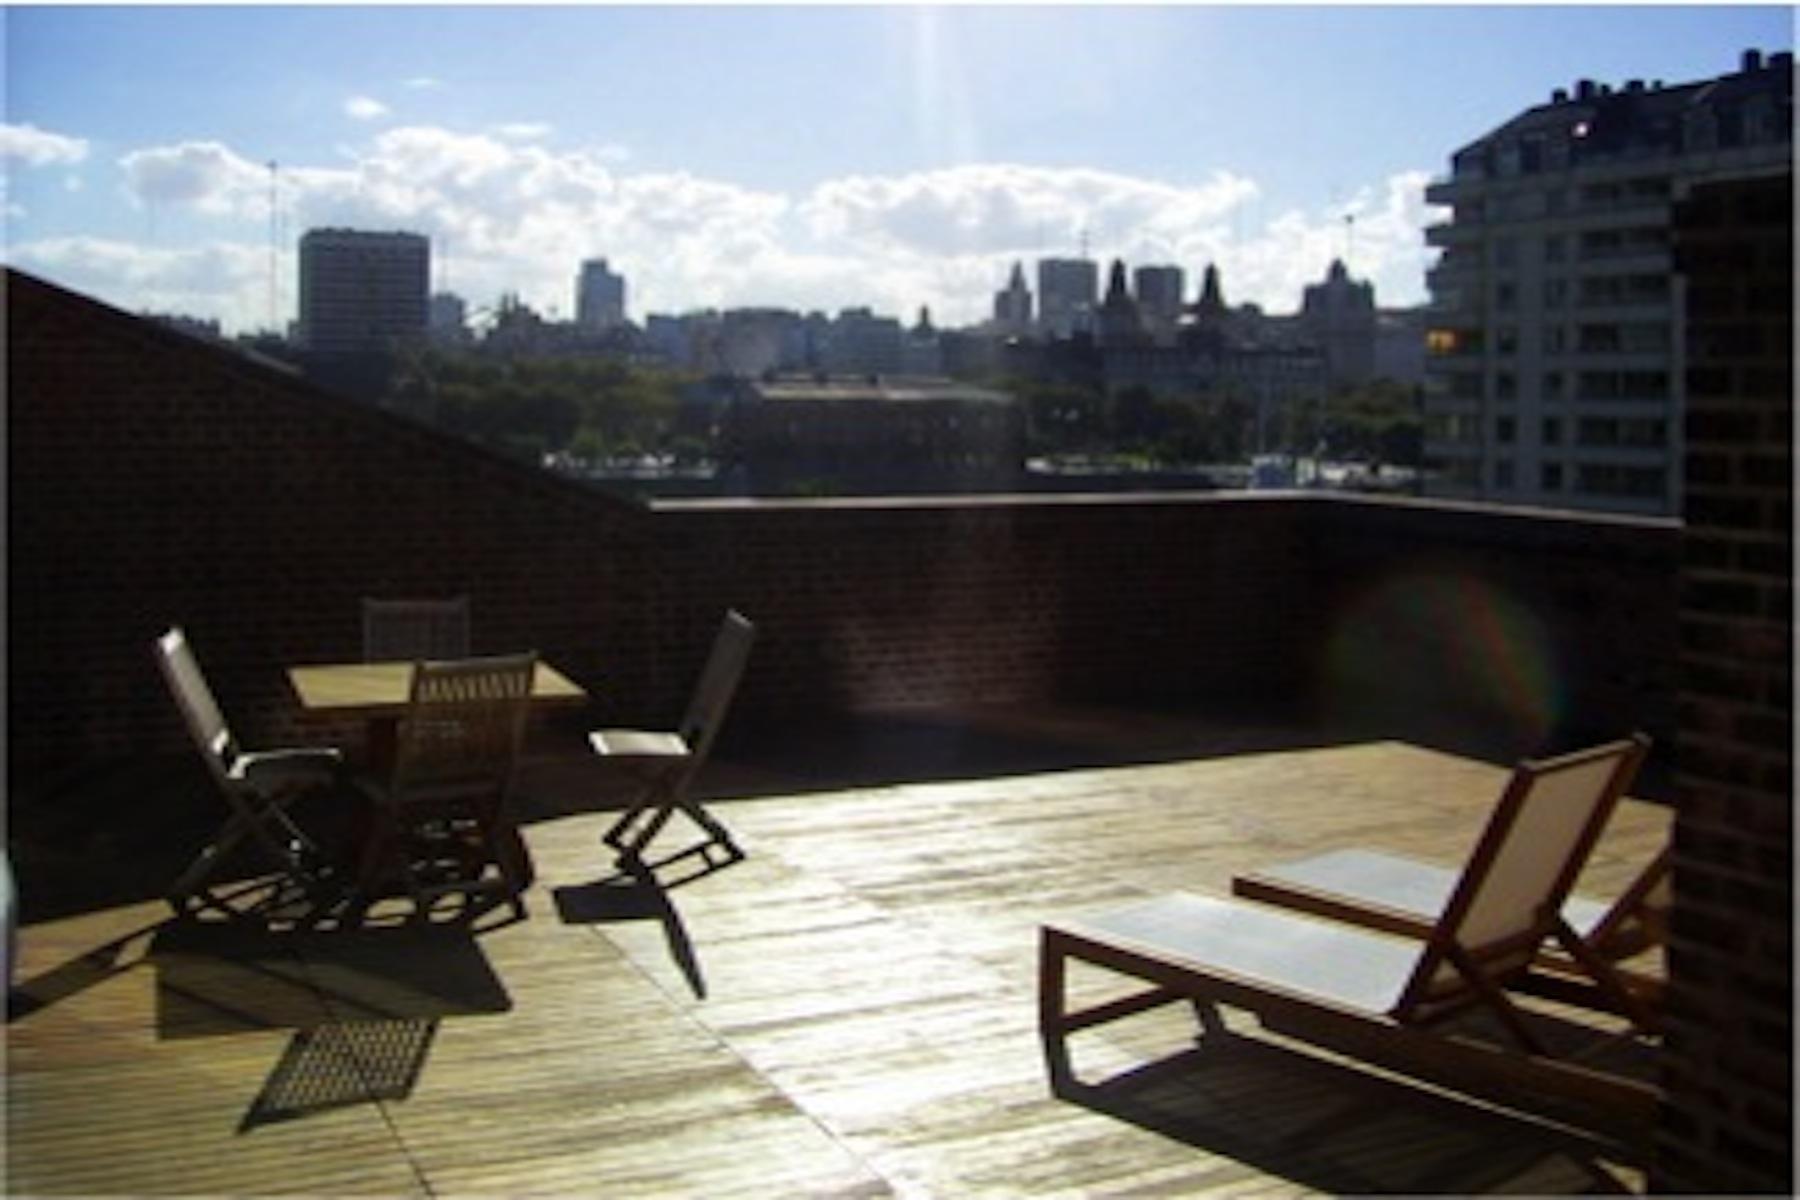 Apartamento para Venda às Sophisticated Duplex in El Porteño building Petrona Eyle 450 Other Argentina, Outras Áreas Na Argentina, 1107 Argentina